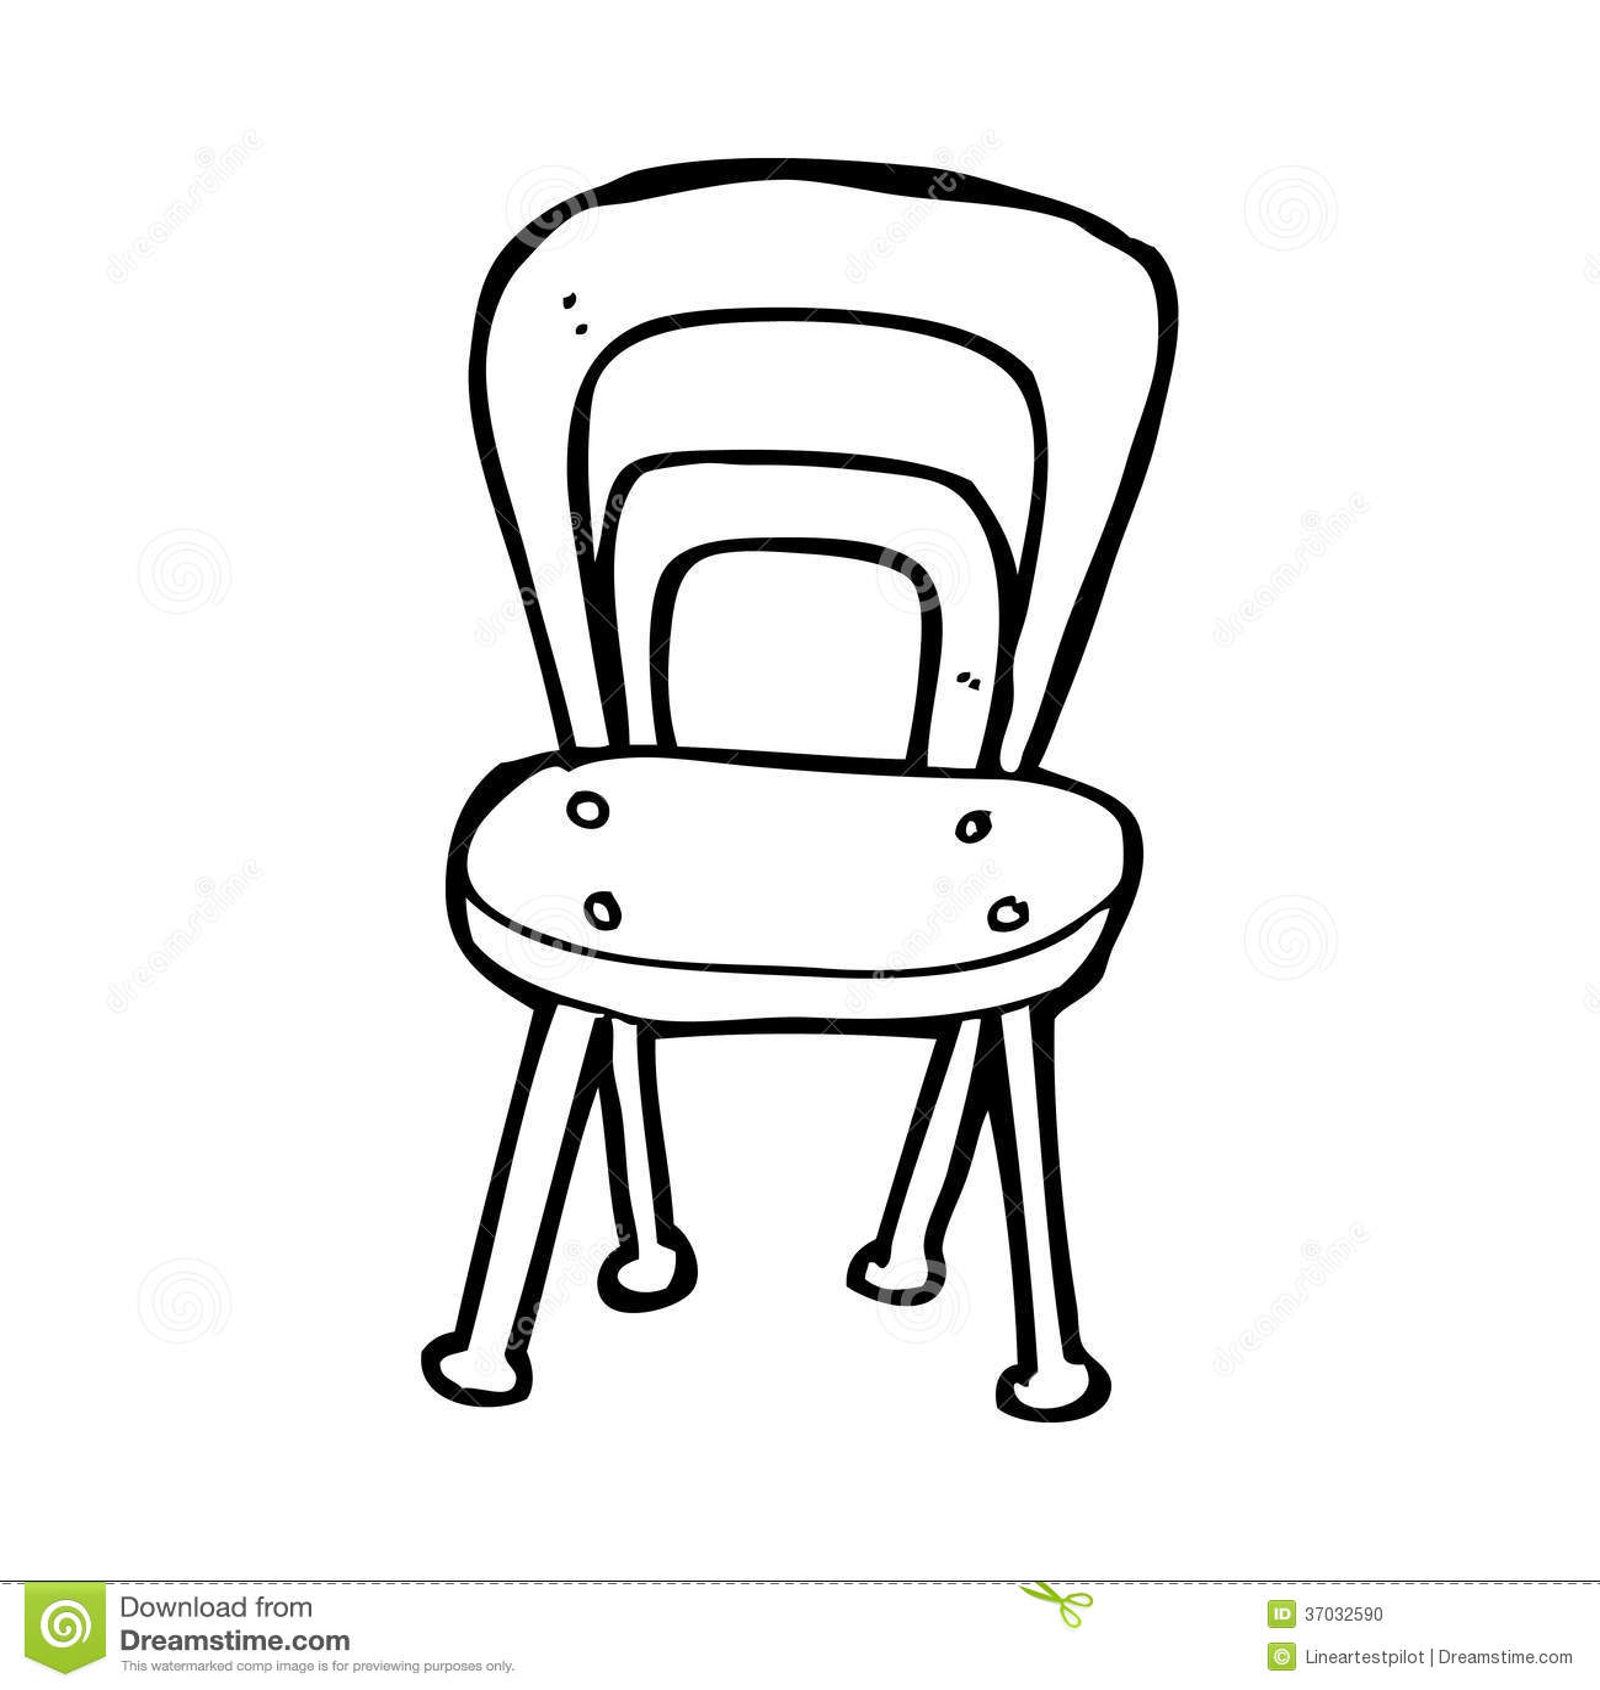 Cartoon Chair Stock Illustration. Illustration Of Quirky